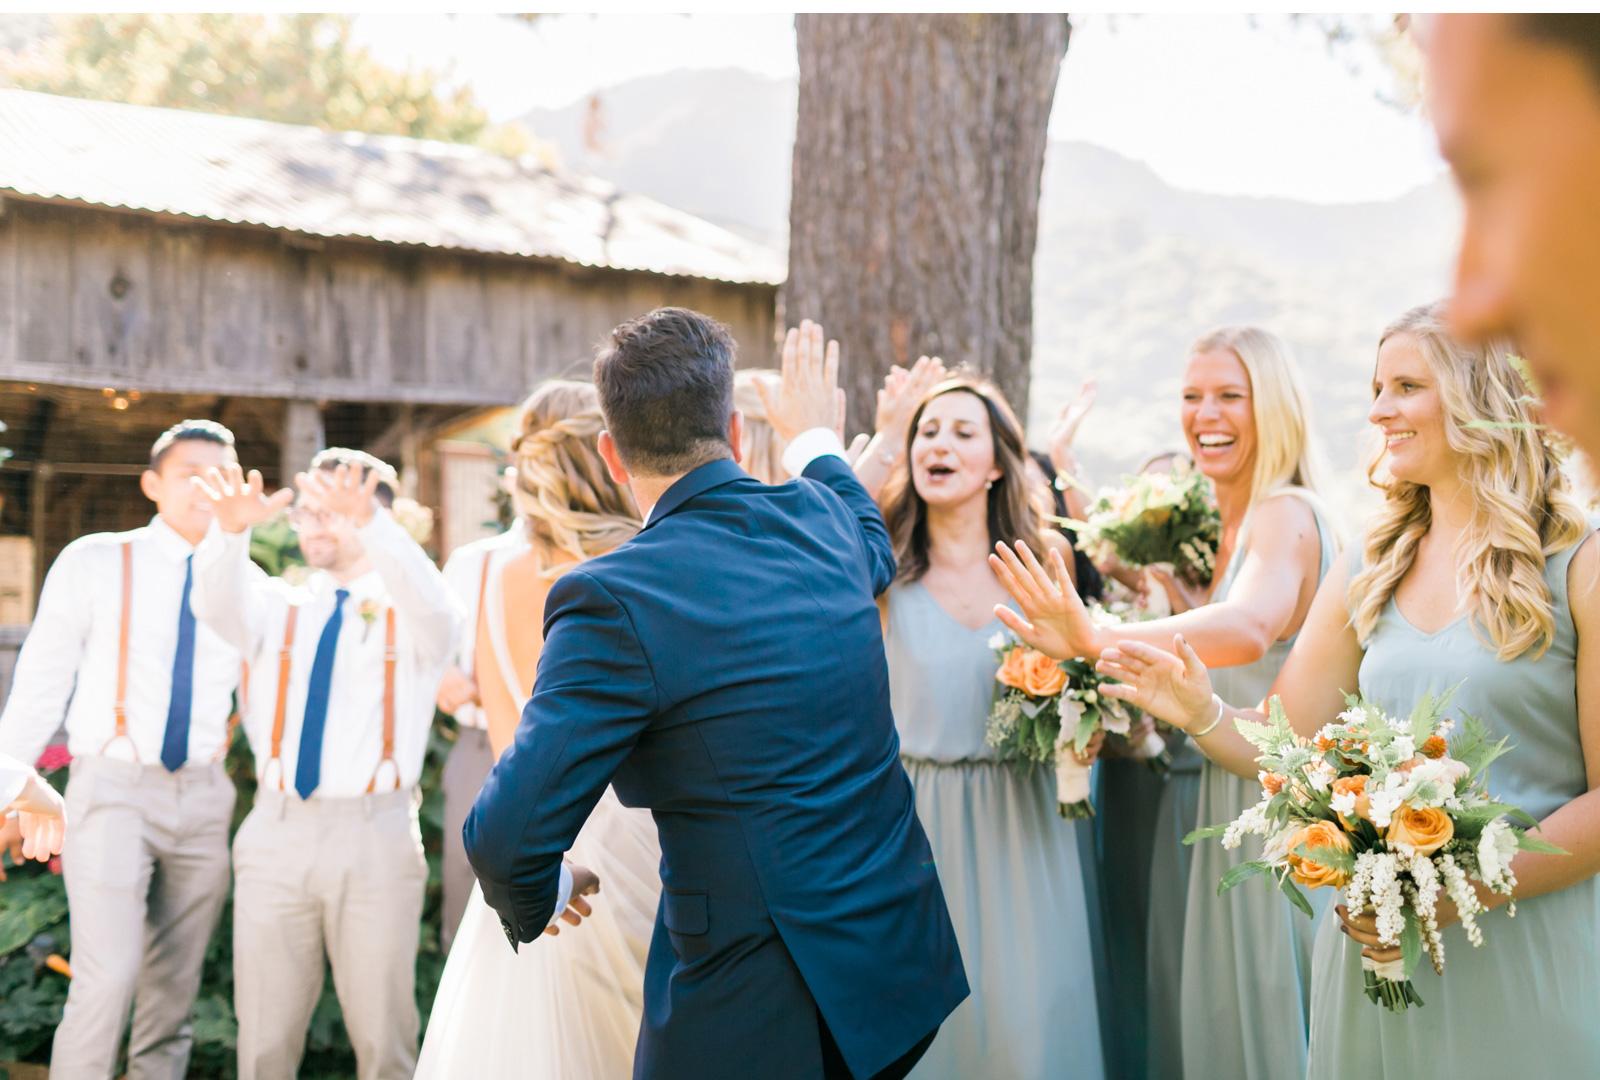 Sea-Canyon-Fruit-Ranch-Wedding-Natalie-Schutt-Photography_03.jpg